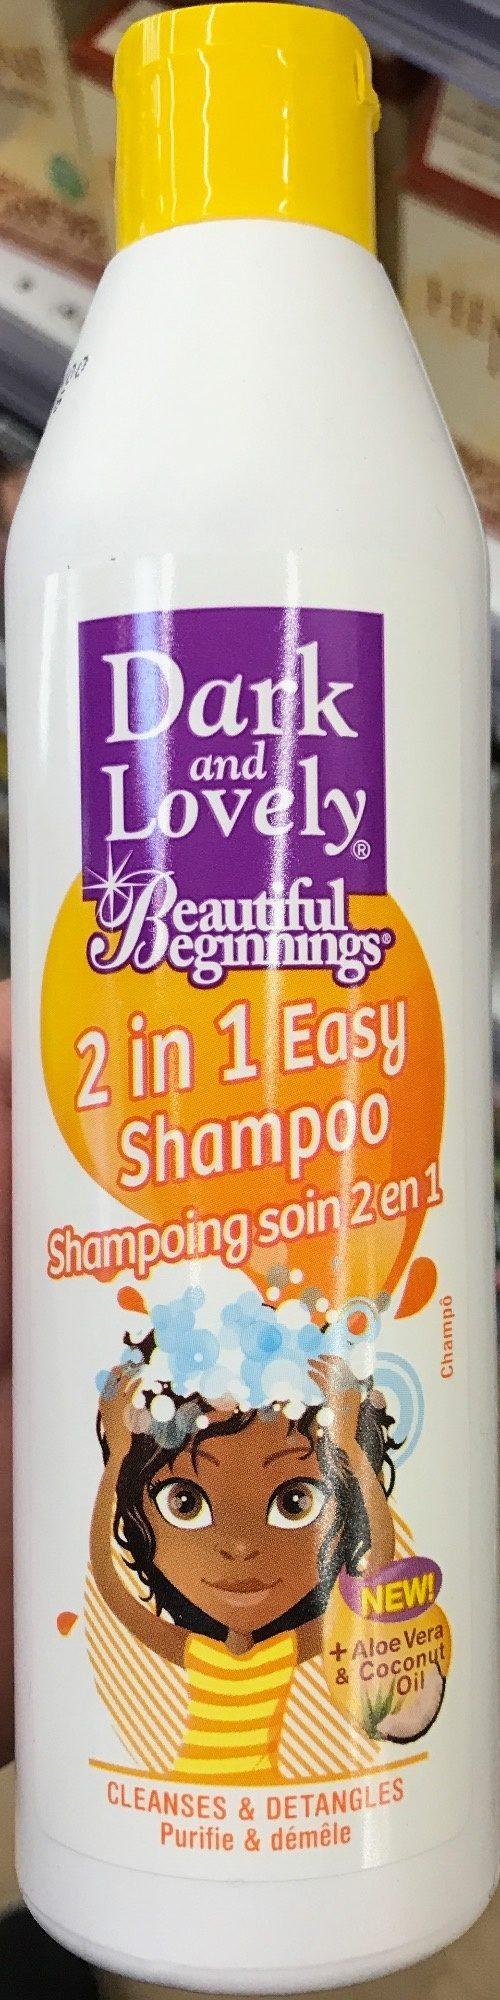 Beautiful Beginnings Shampooing soin 2 en 1 - Product - fr